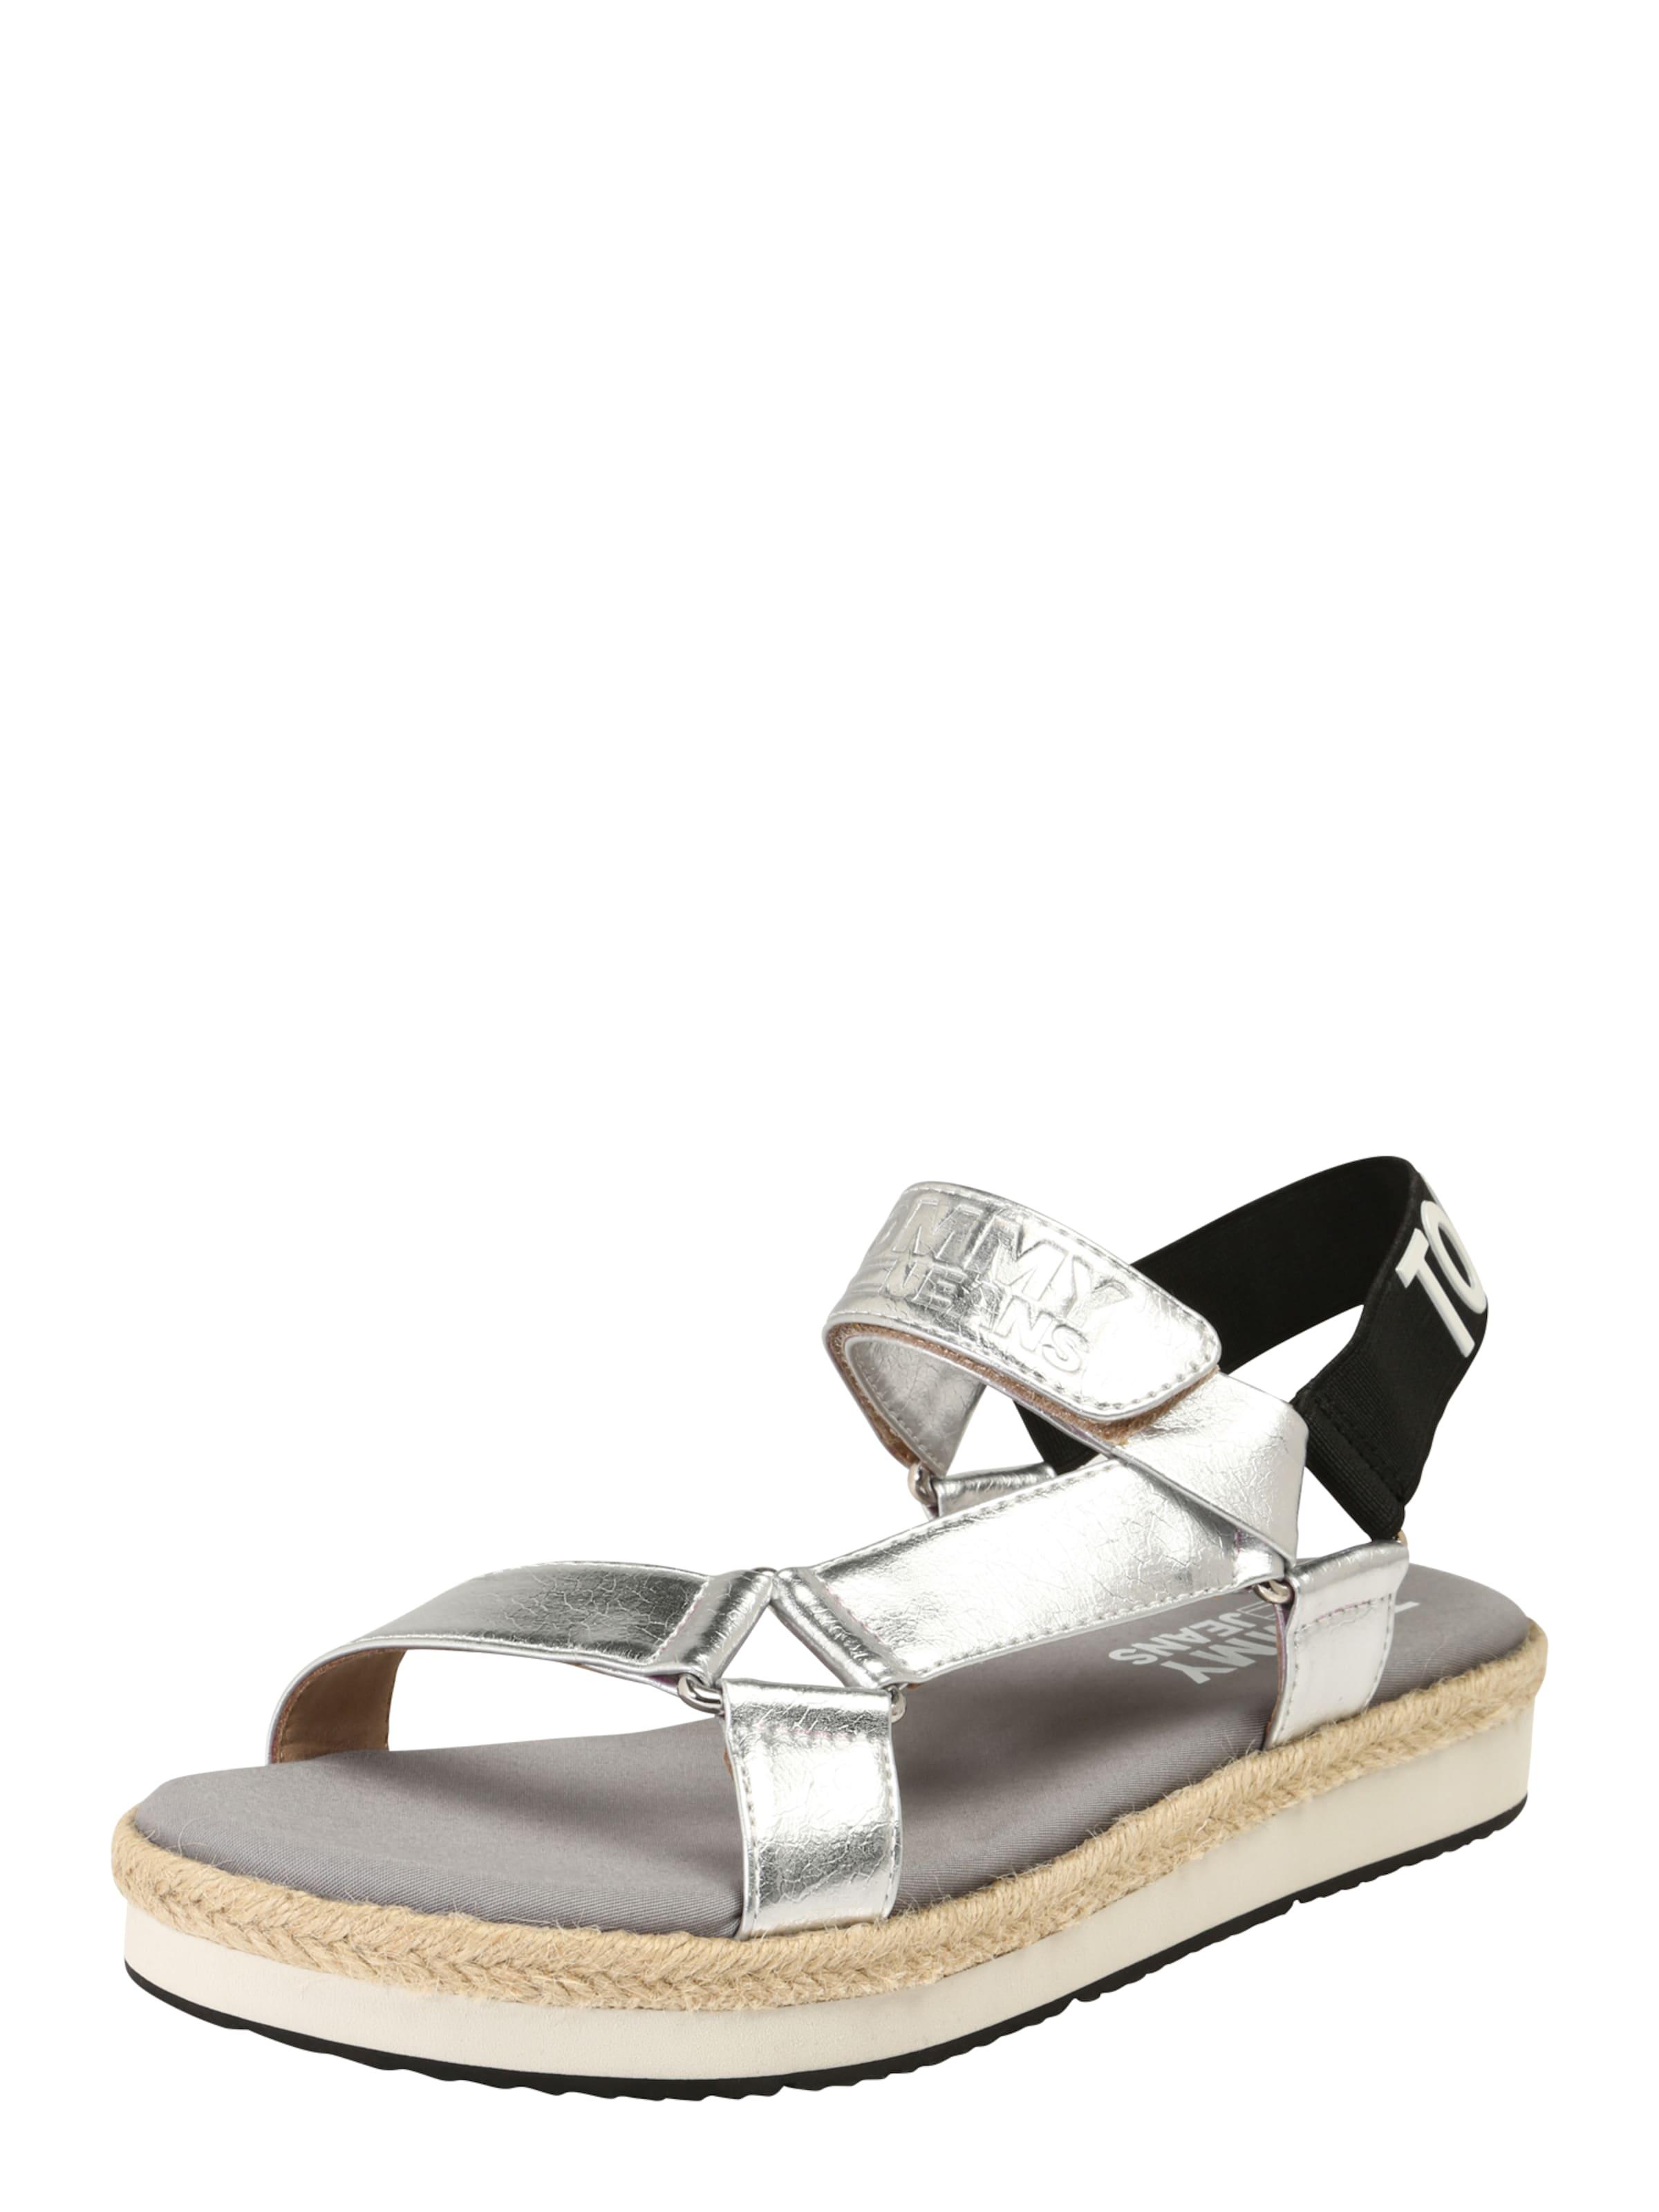 Sandale FRESH MODERN METALLIC Tommy Jeans nqnsyc4398 Schuhe